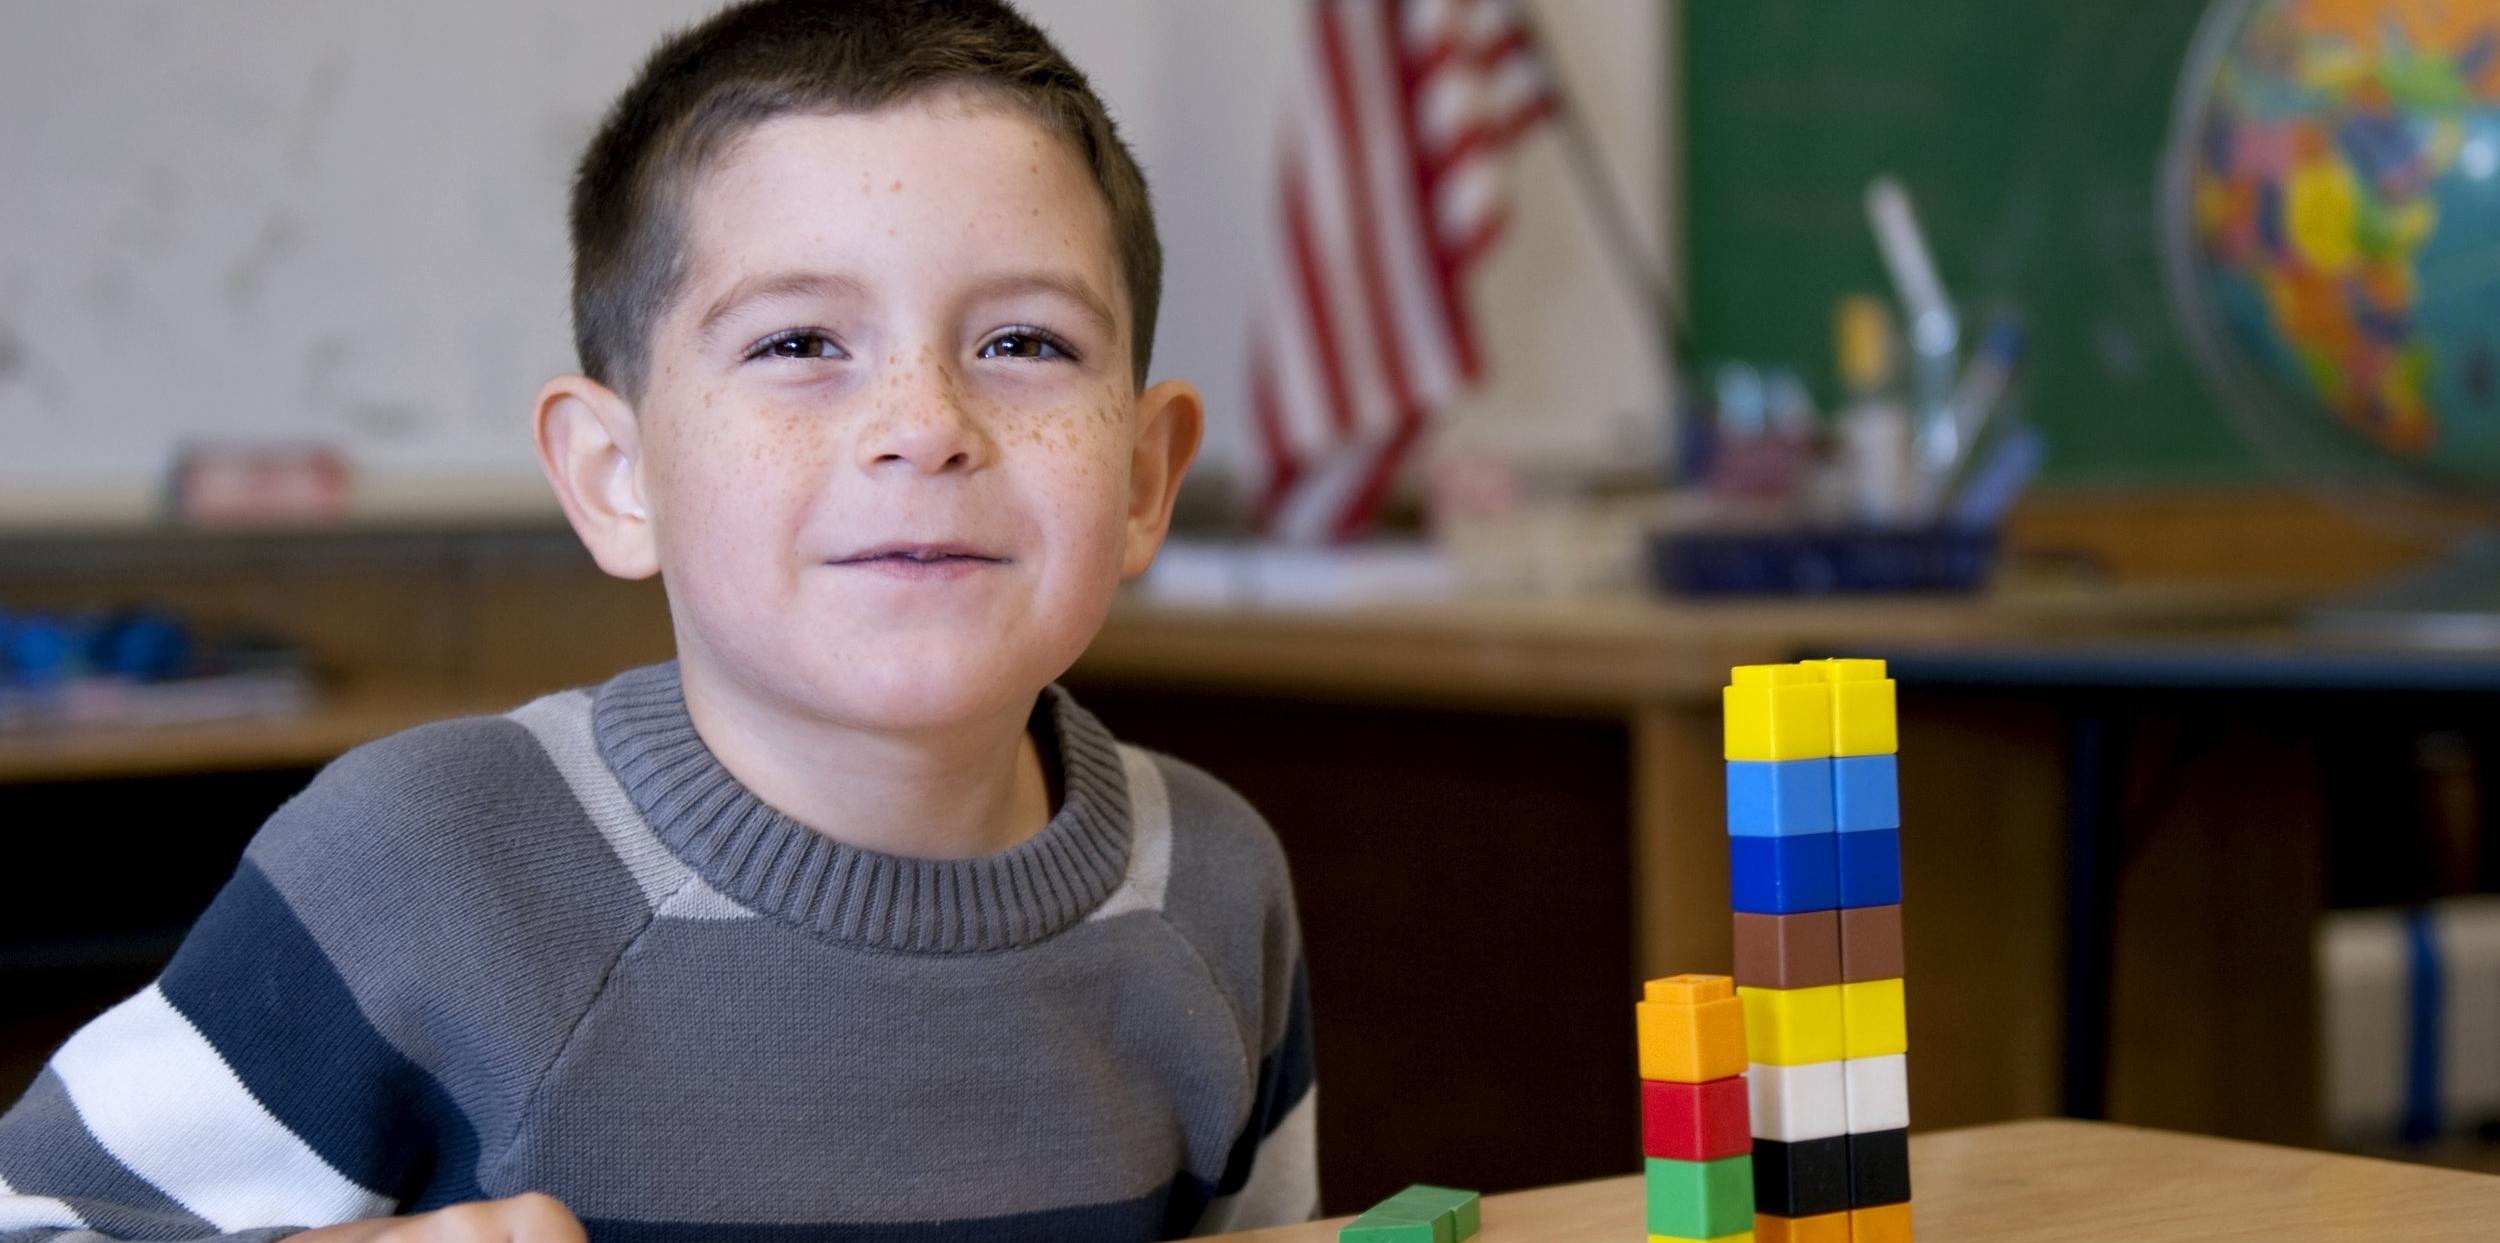 Boy with math manipulative blocks